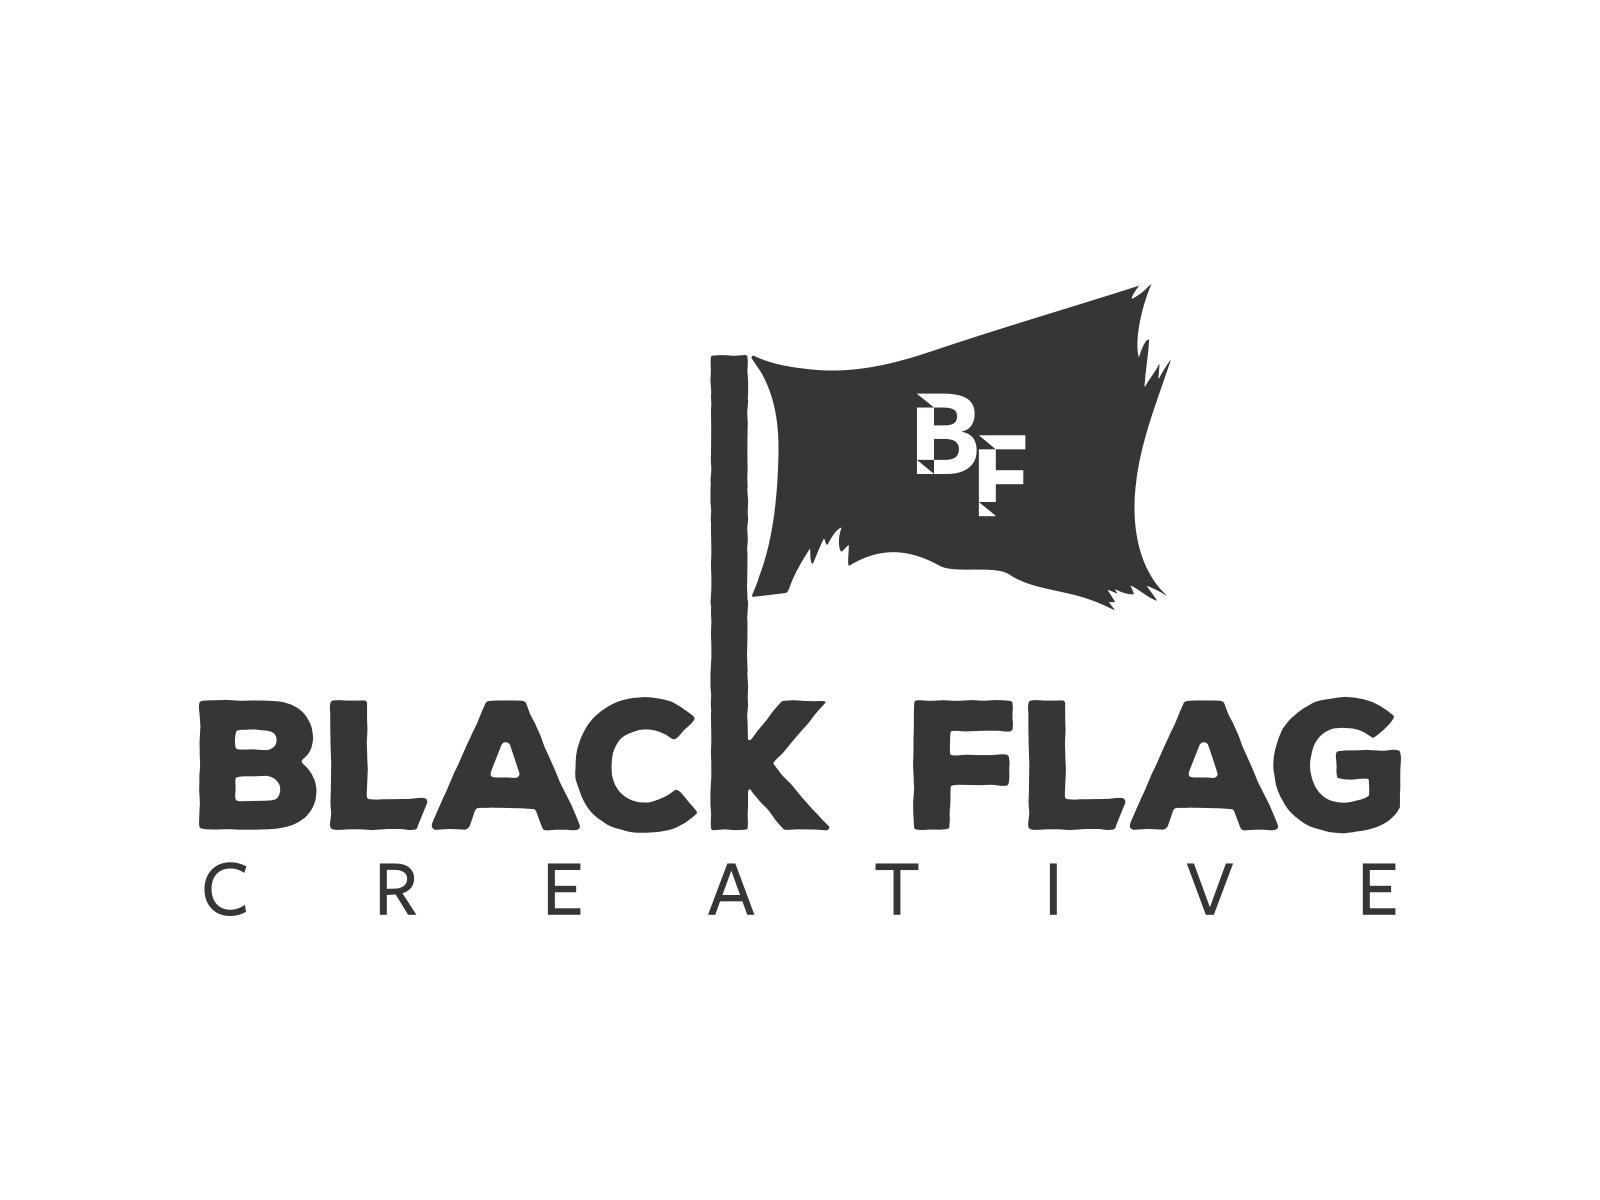 Blackflagcreativelogo large black